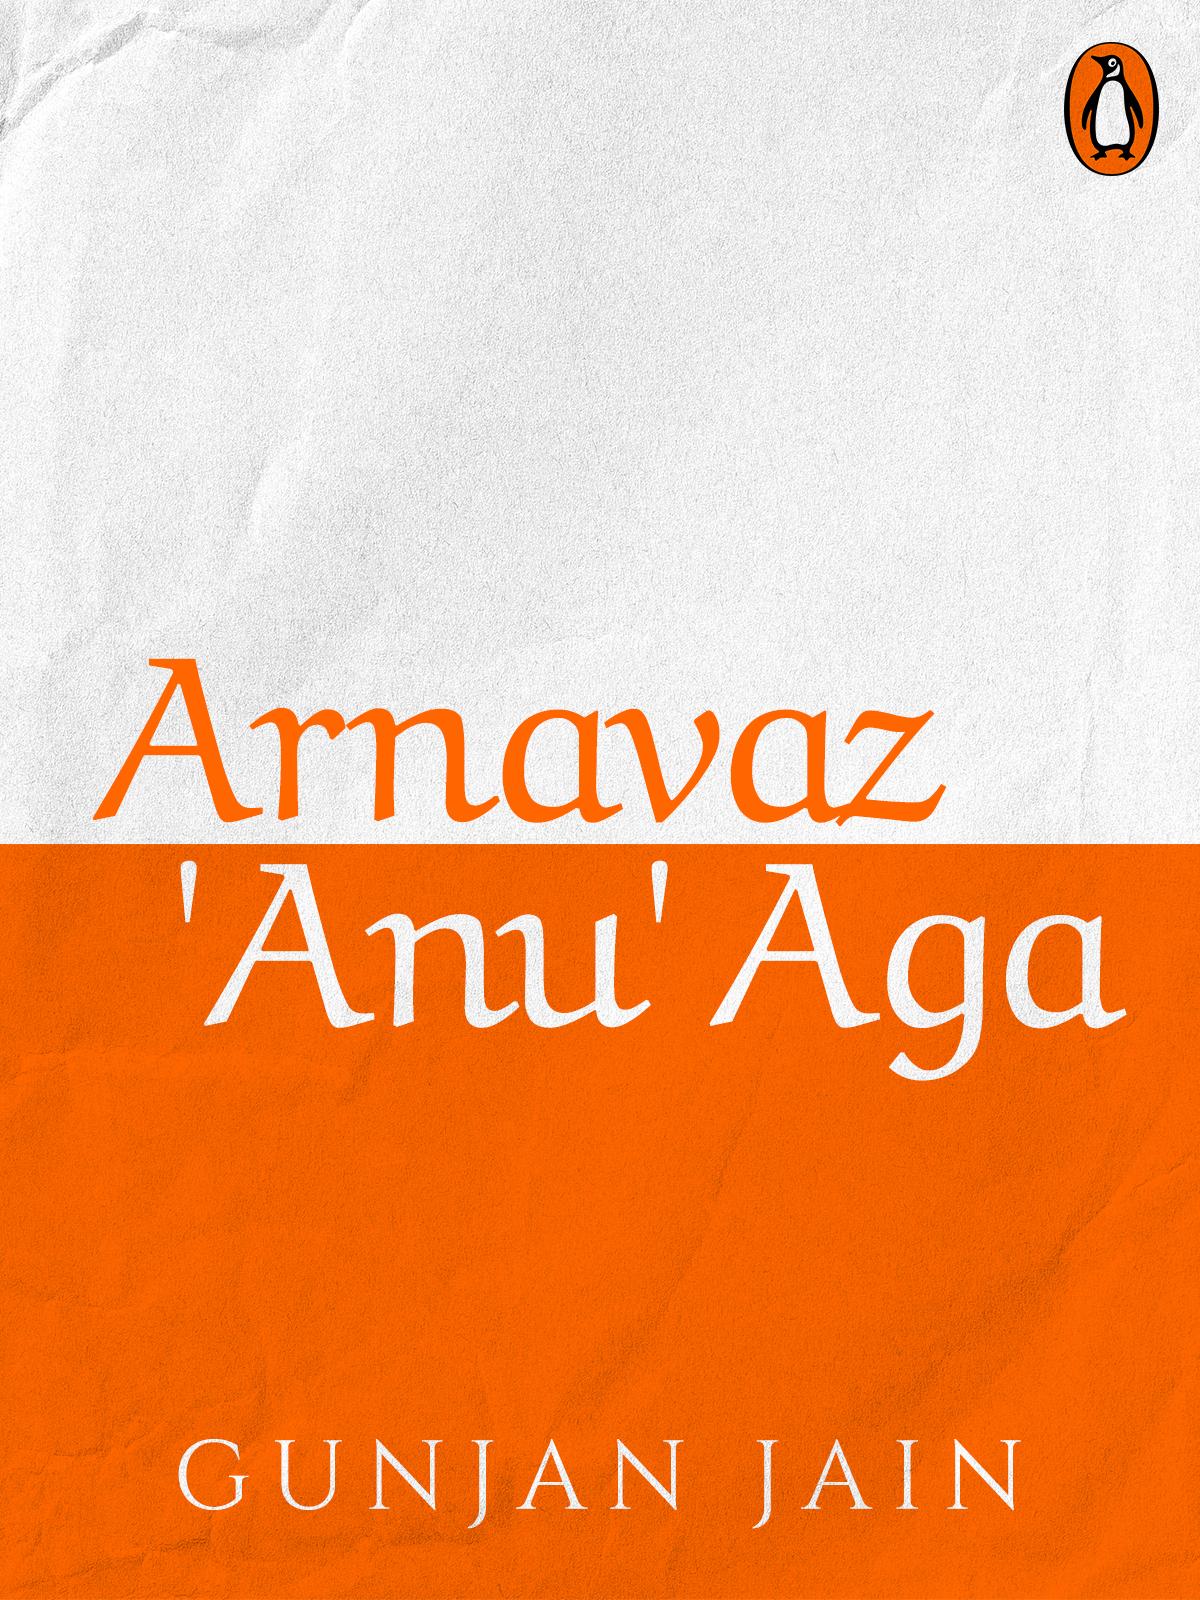 Arnavaz 'Anu' Aga